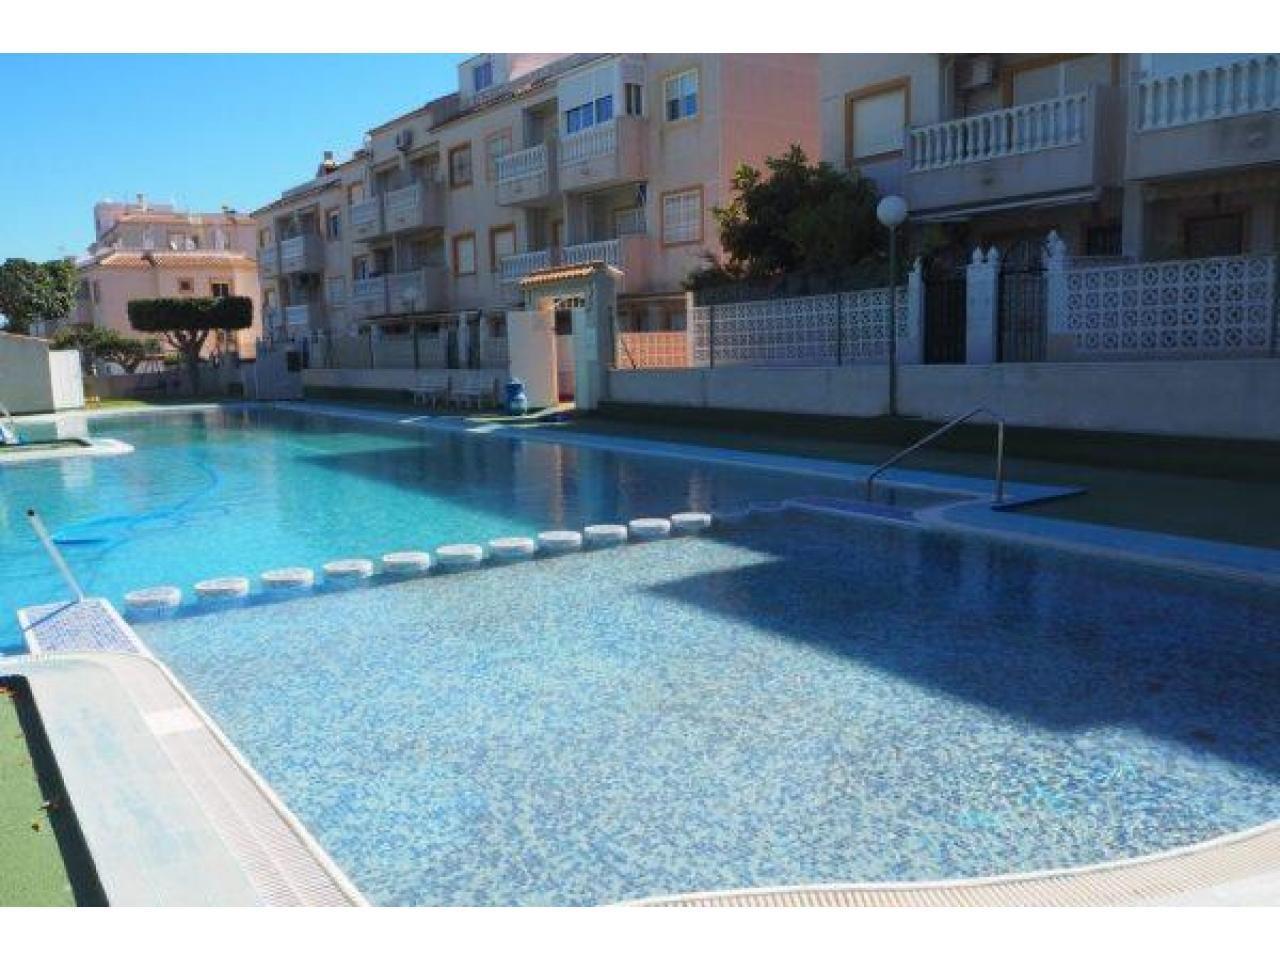 Недвижимость в Испании, Квартира c видами на море в Торревьеха,Коста Бланка,Испания - 10